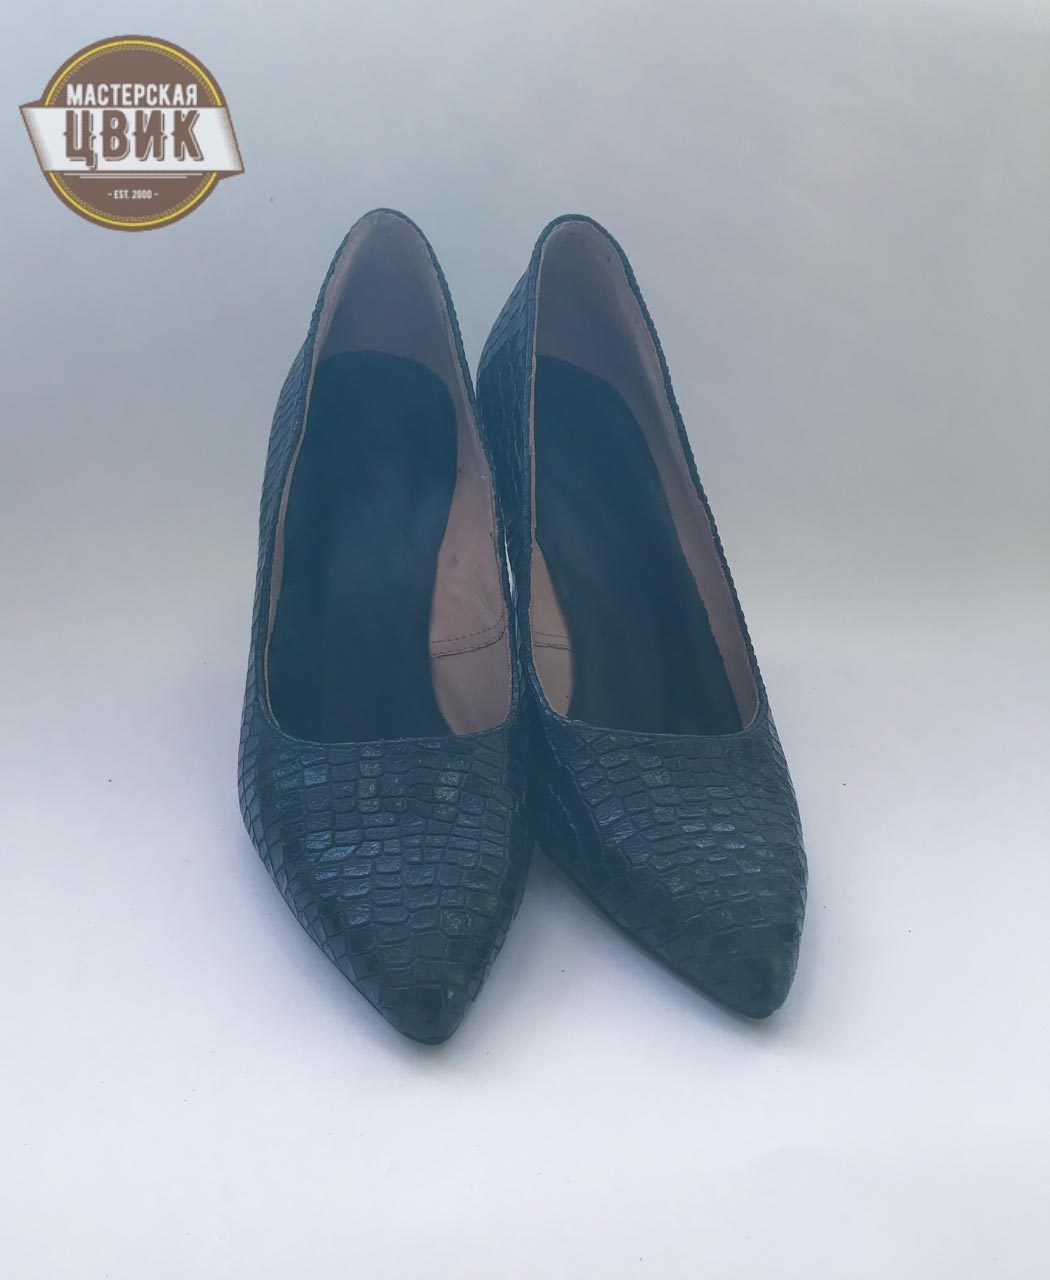 individualnyj-poshiv-obuvi-minsk-36 Индивидуальный пошив обуви